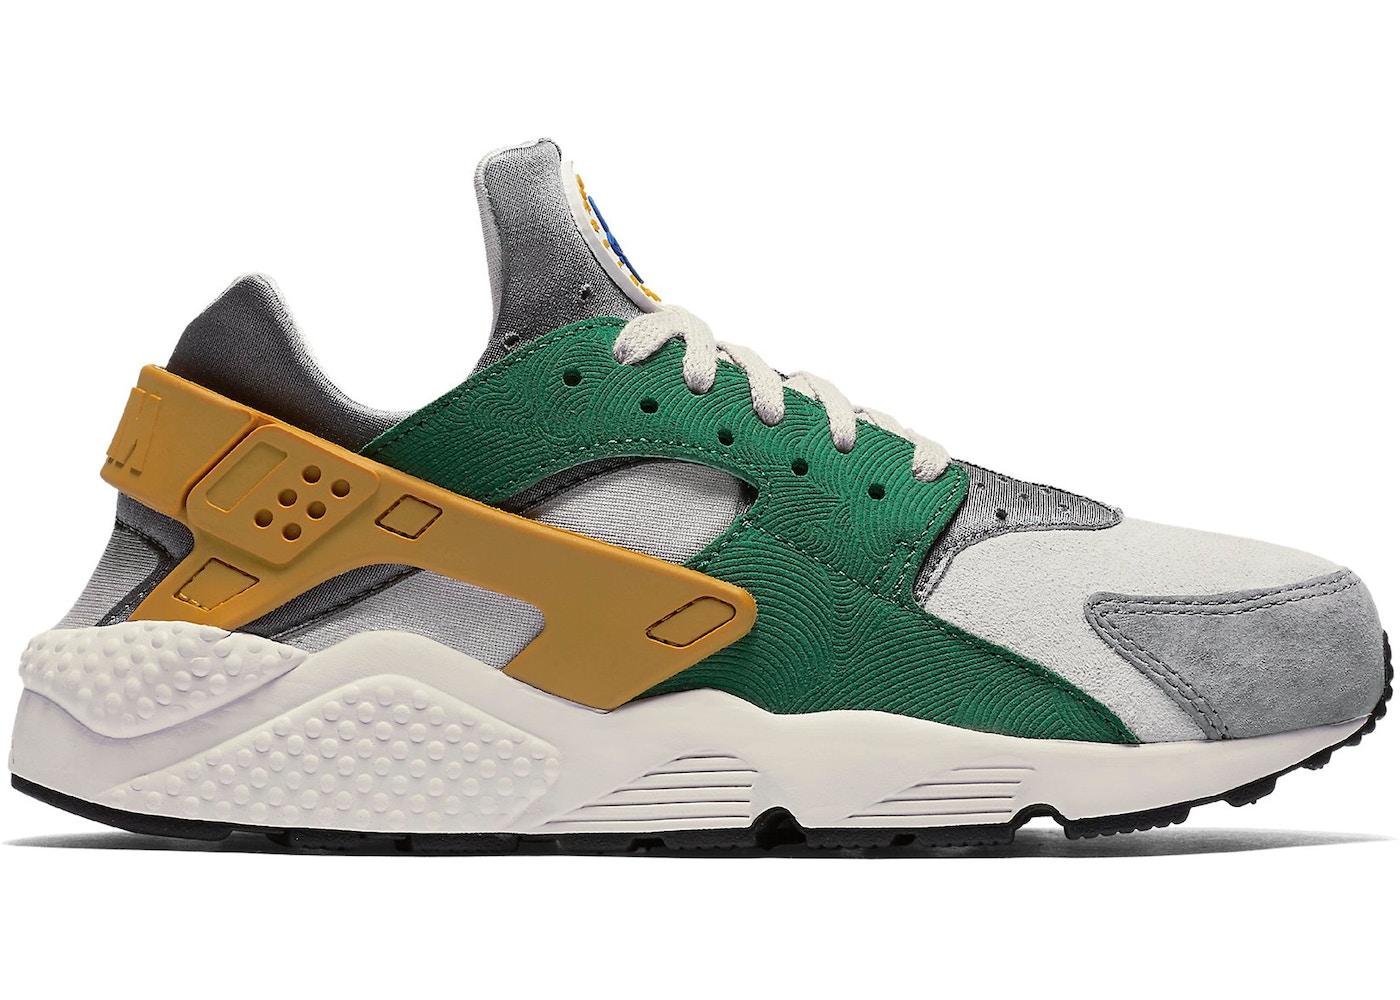 historia Detener malla  Nike Air Huarache Run Pine Green Gold Leaf - 852628-300